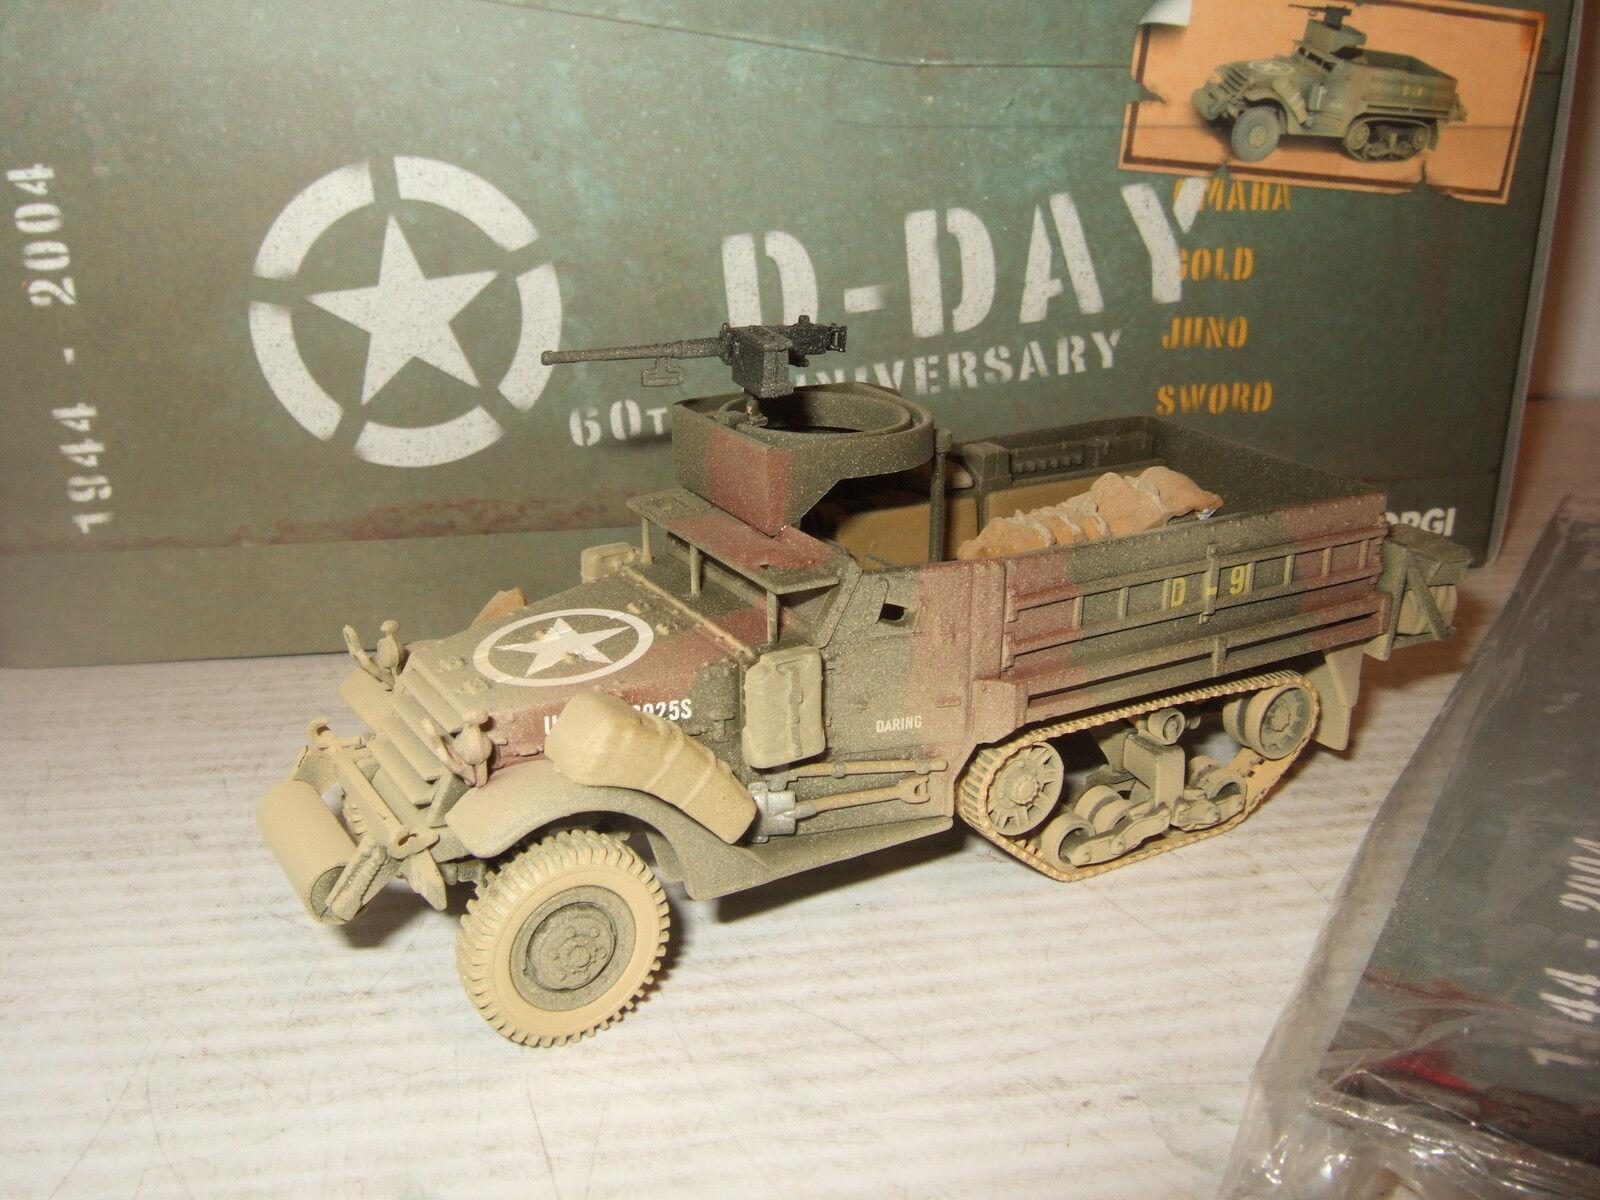 el estilo clásico Corgi US60401 US60401 US60401 M3 A1 de media pista, US Army, 41st Armd INF, Día D, Escala 1 50.  solo para ti